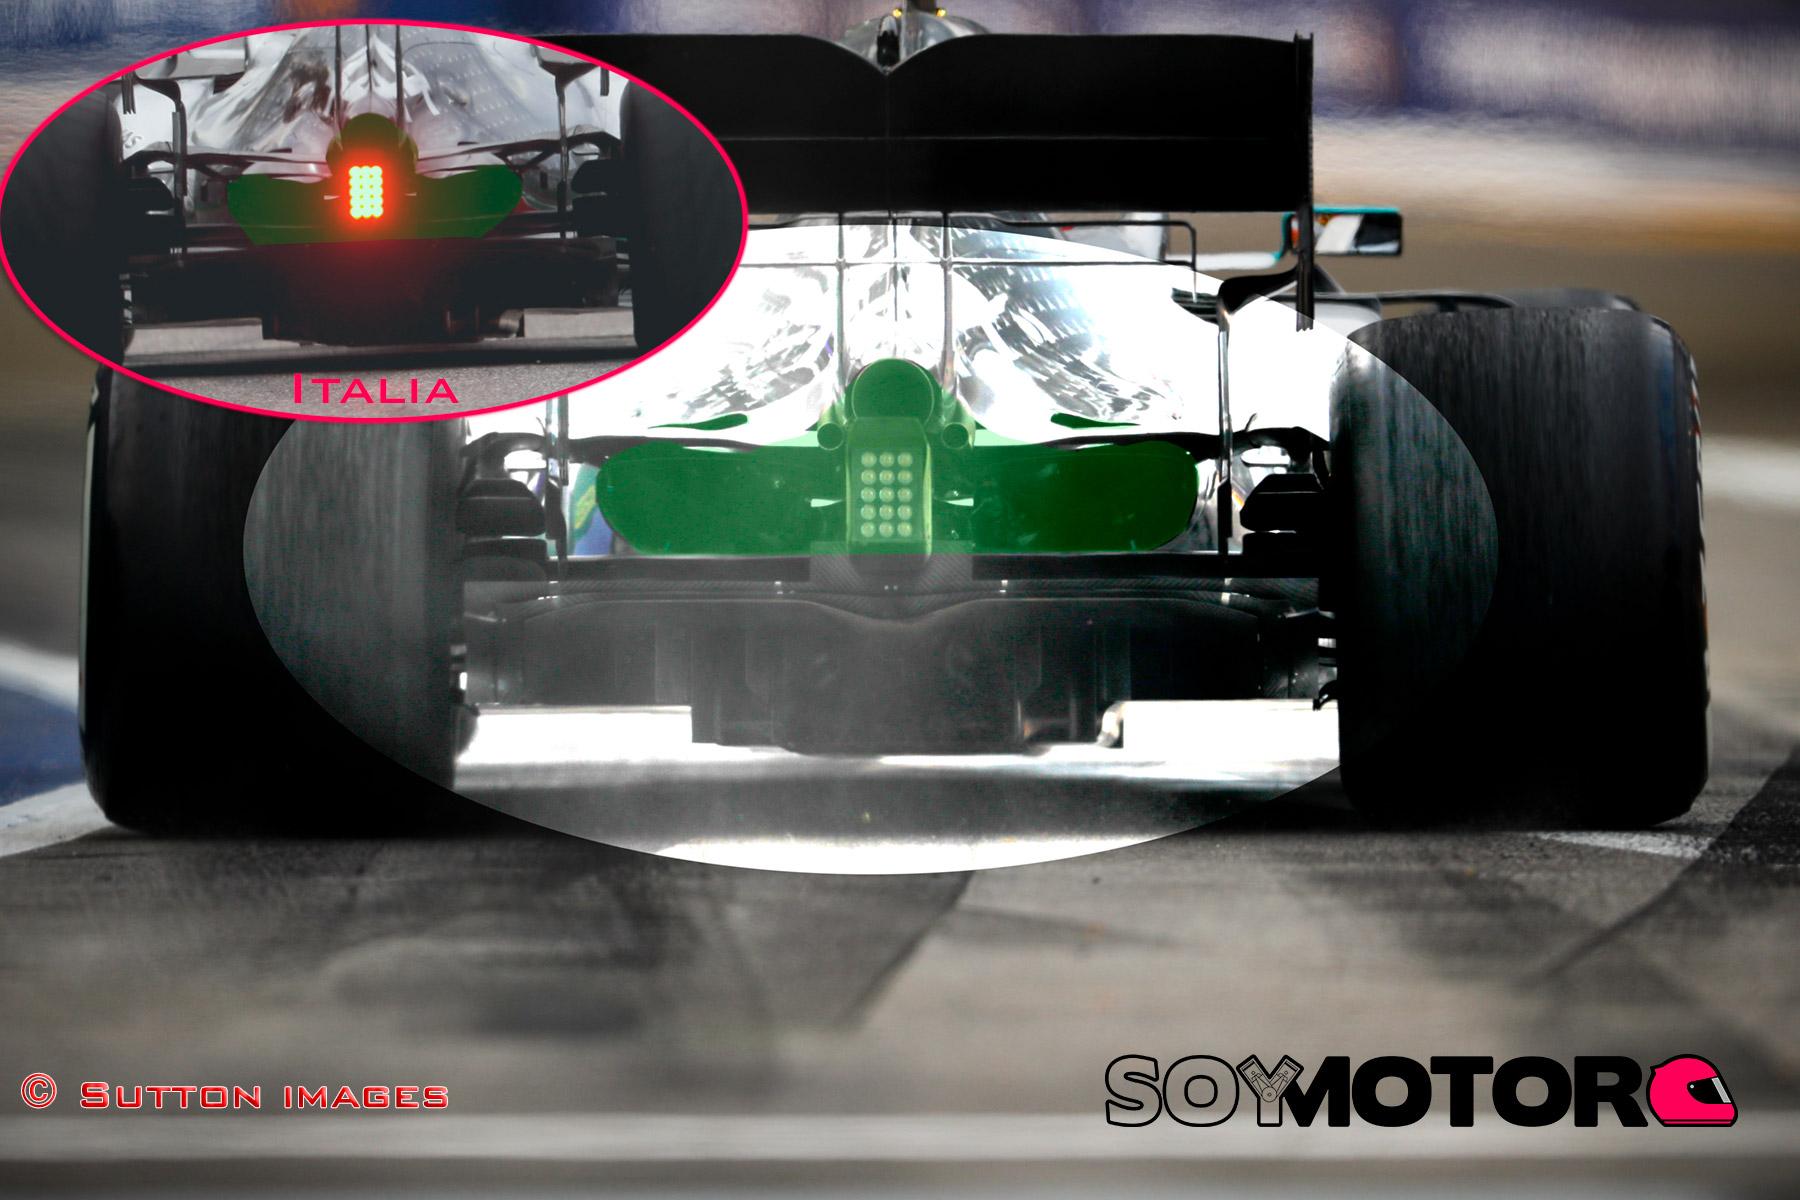 mercedes-salida-posterior-soymotor.jpg